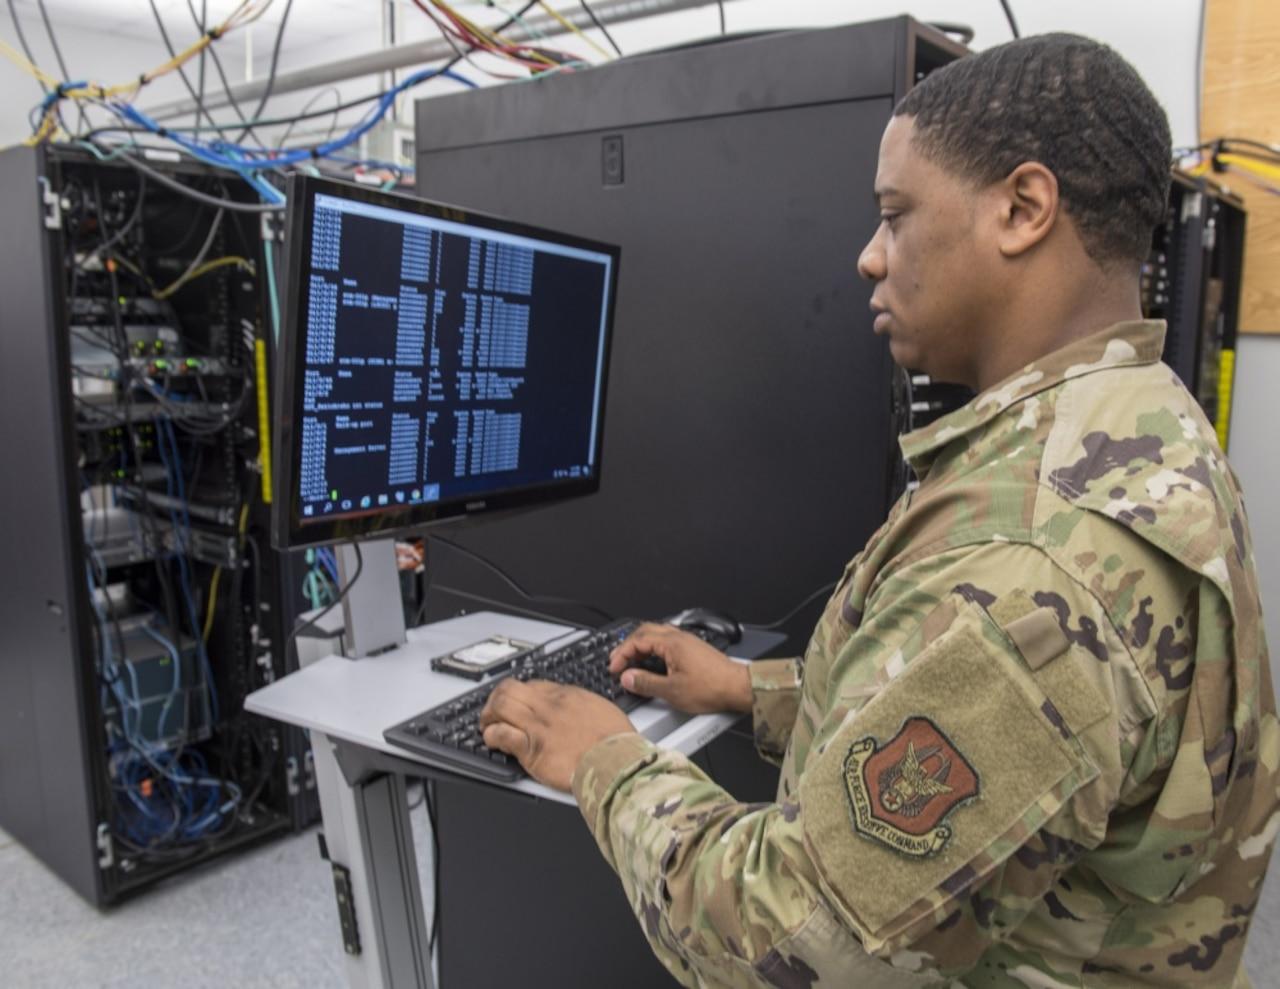 Service member monitors cyber threat.